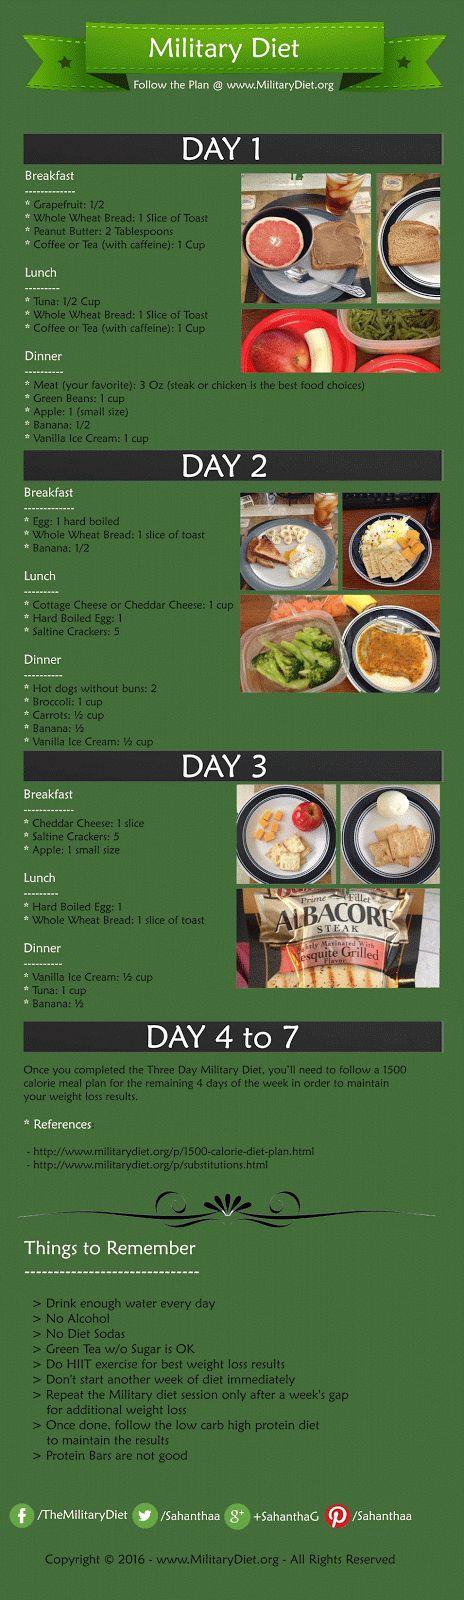 50 Quick, Low-Calorie, Filling Breakfast Ideas 50 Quick, Low-Calorie, Filling Breakfast Ideas new picture